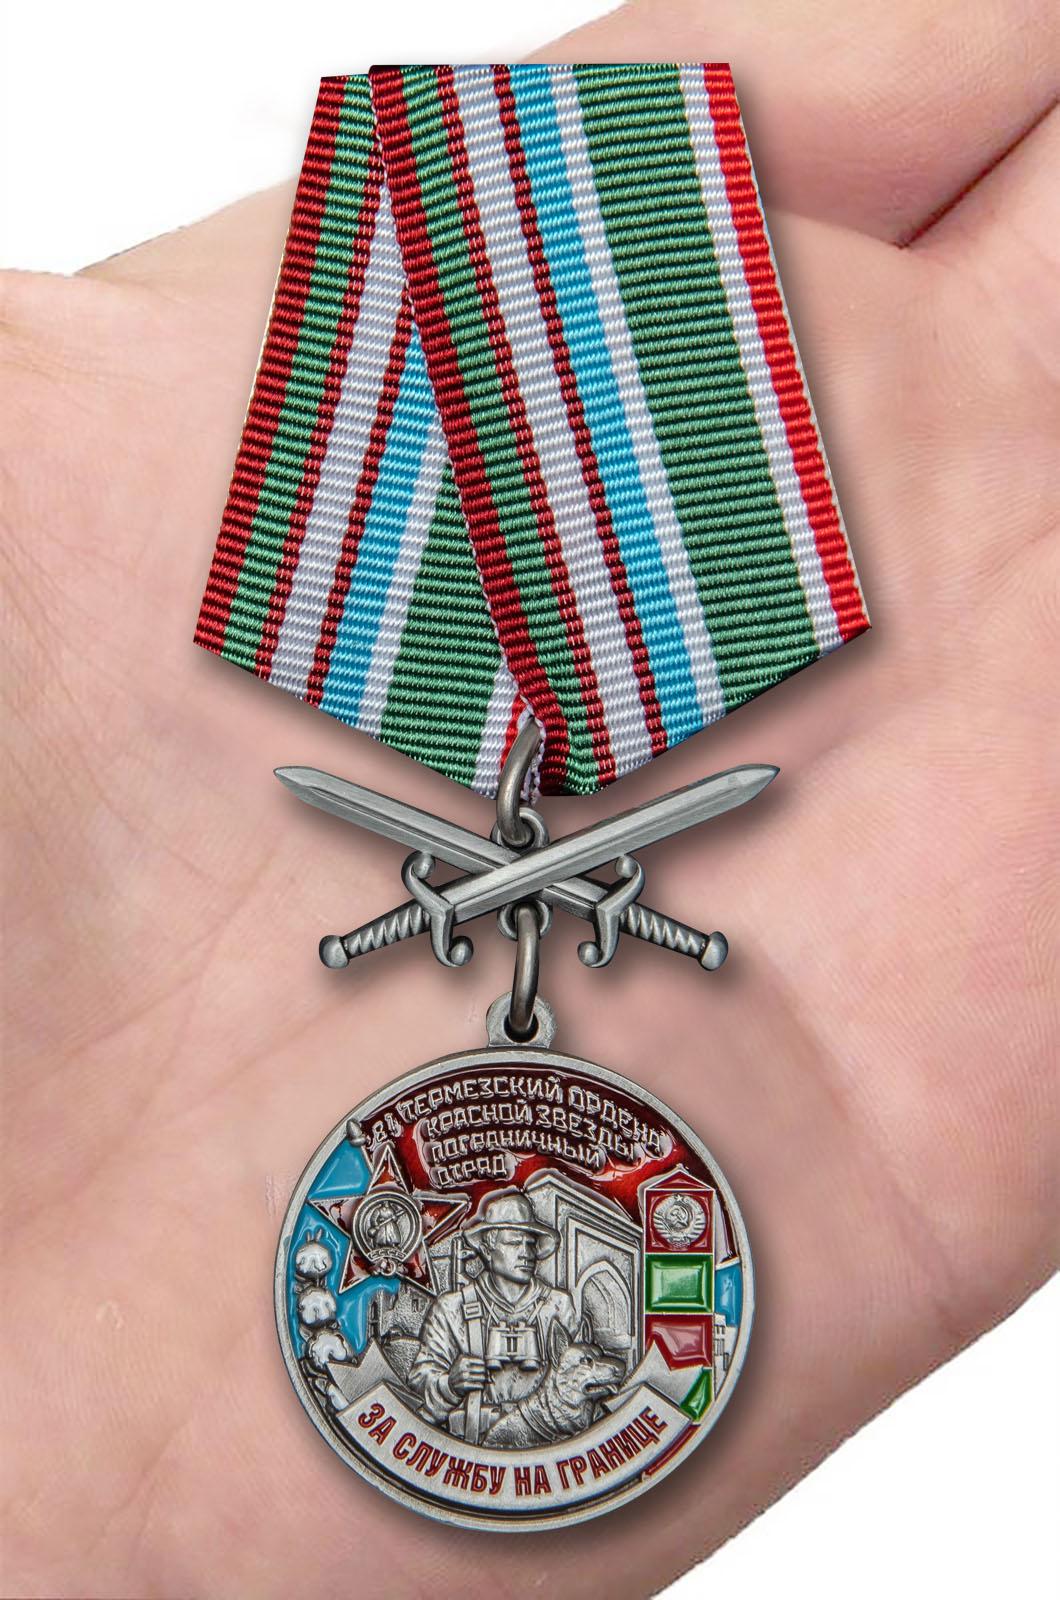 Наградная медаль За службу на границе (81 Термезский ПогО) - вид на ладони